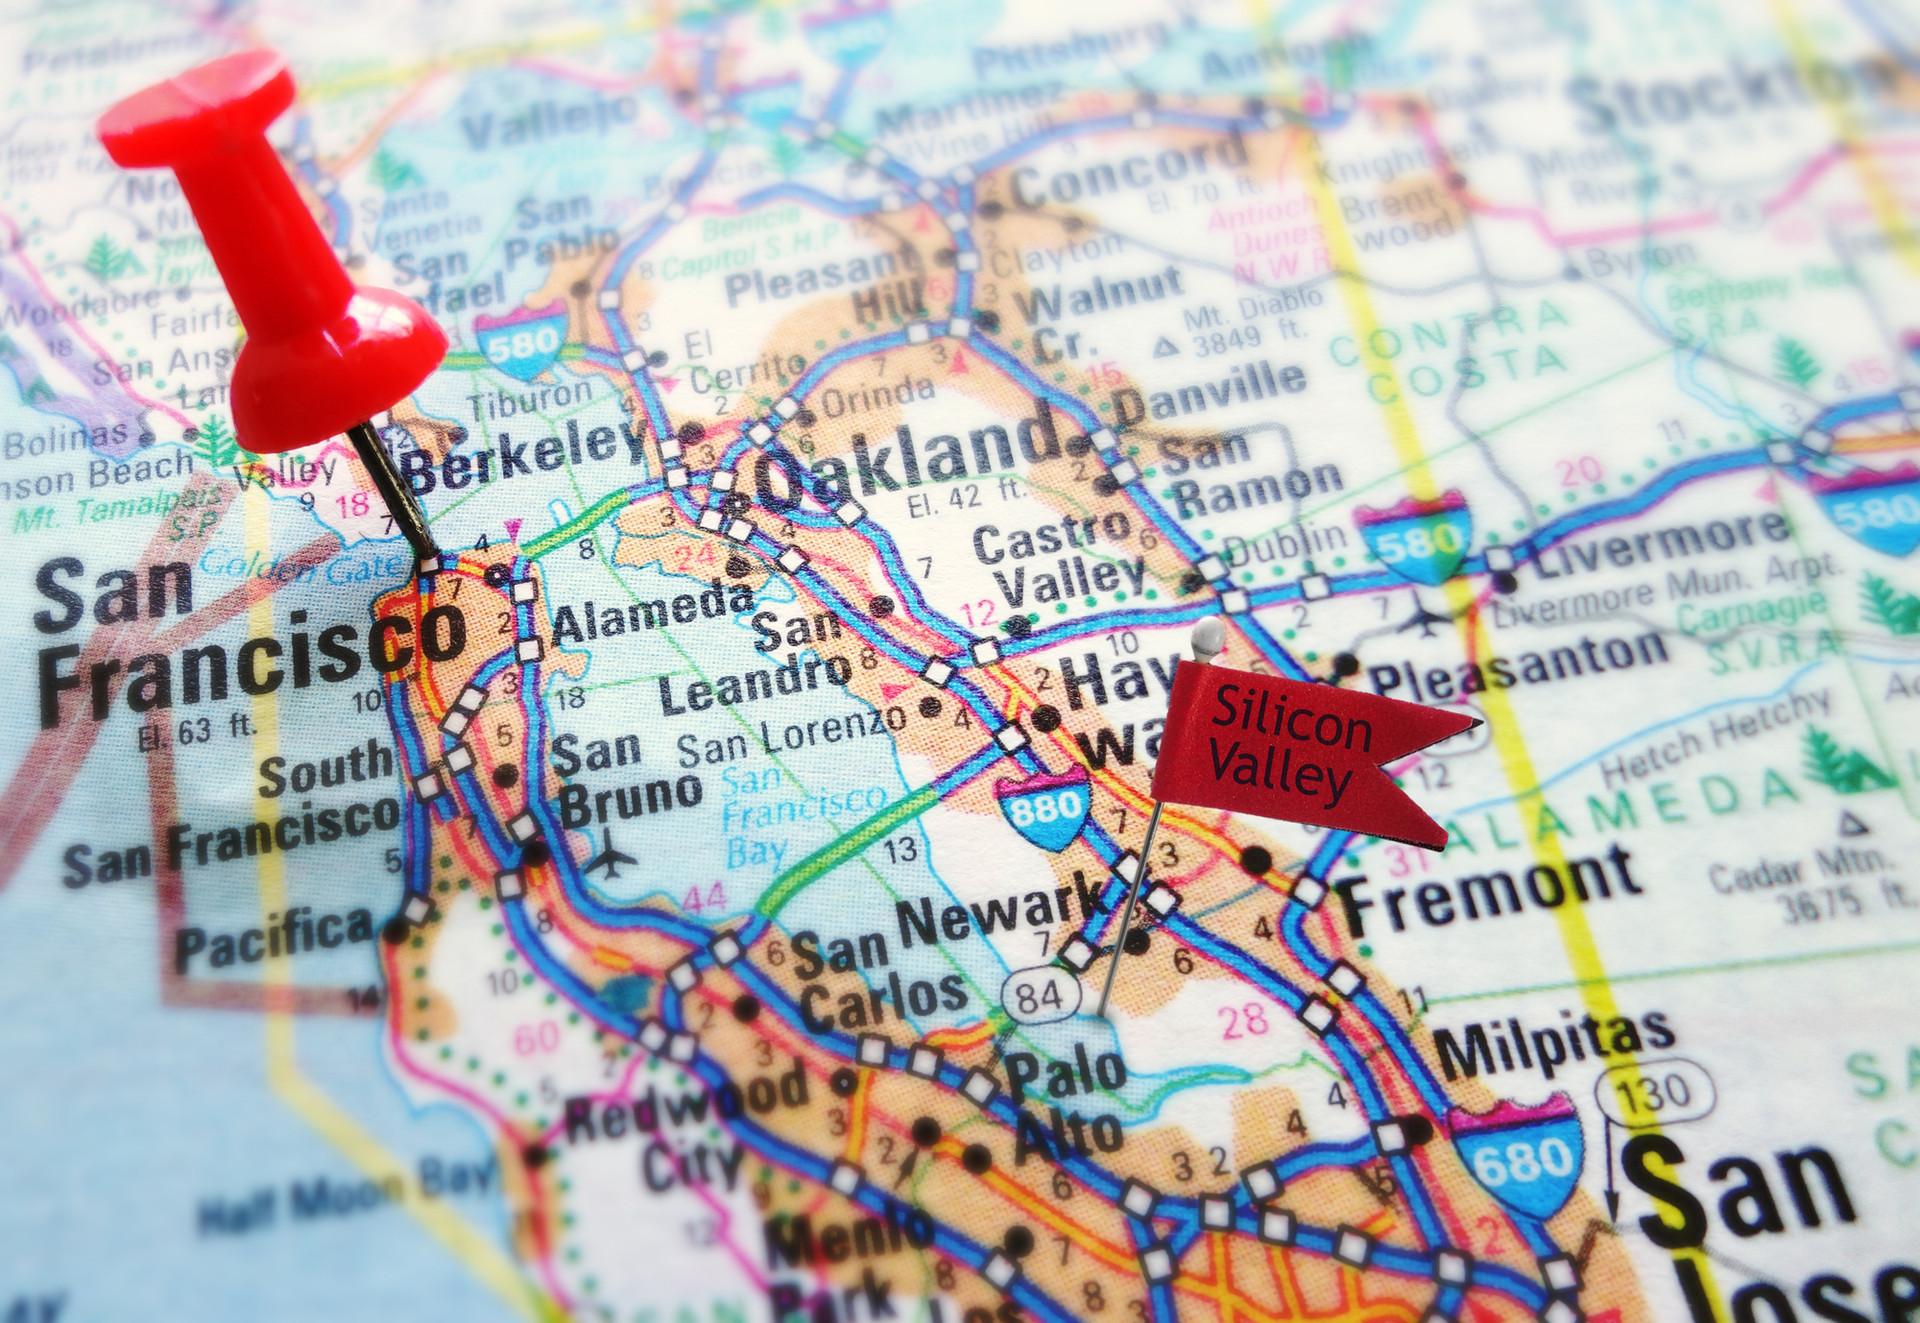 Softlanding Silicon Valley